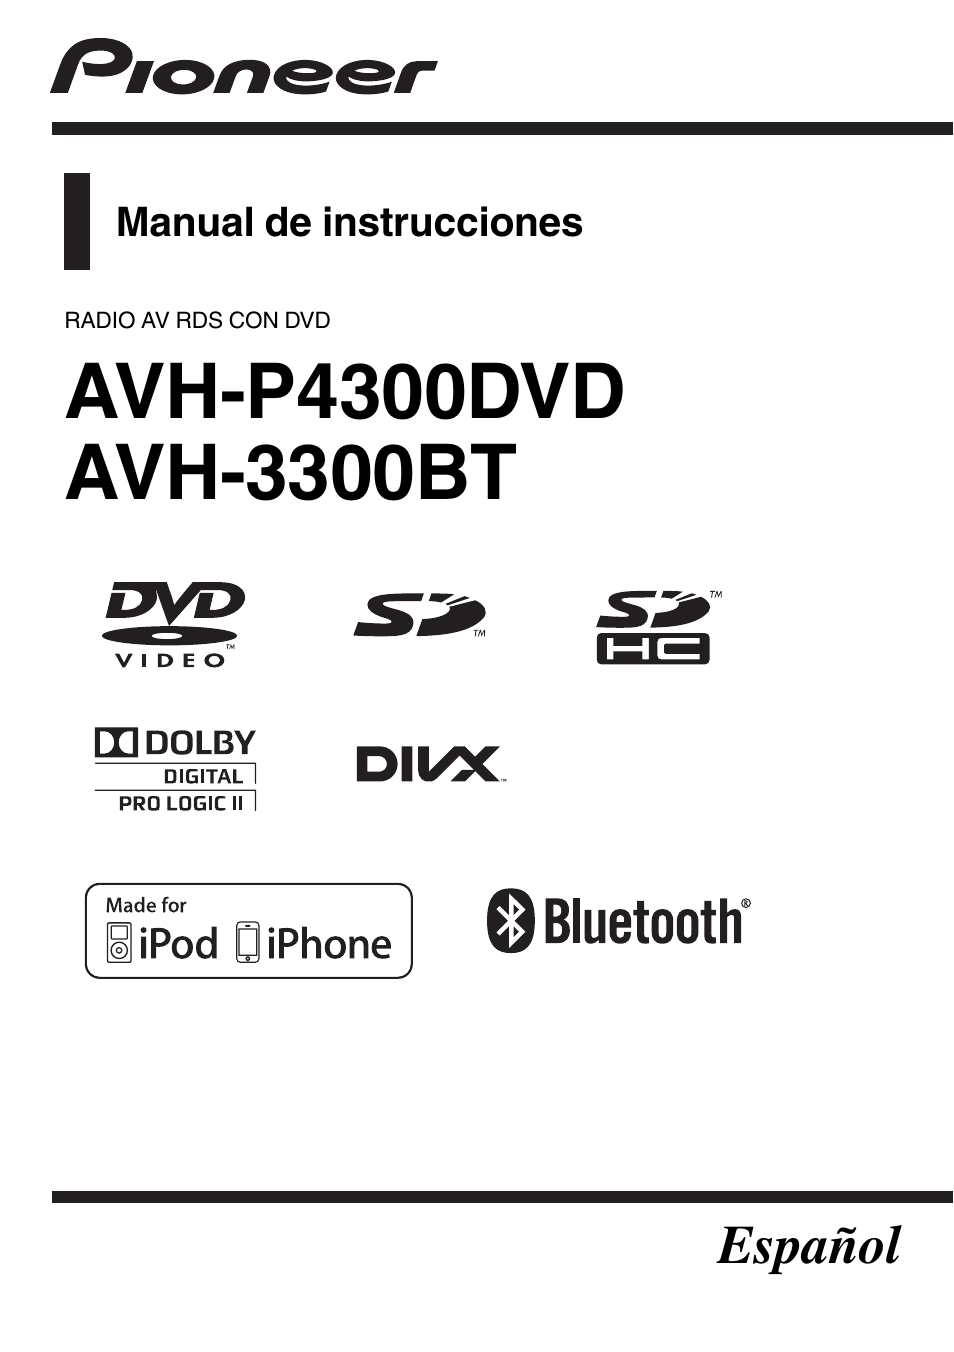 Pioneer Avh P4300dvd Manual Del Usuario P Ginas 104 Tambi N. Pioneer Avh P4300dvd Manual Del Usuario P Ginas 104 Tambi N Para 3300bt. Wiring. Pioneer Avh P4300 Wiring Diagram At Scoala.co